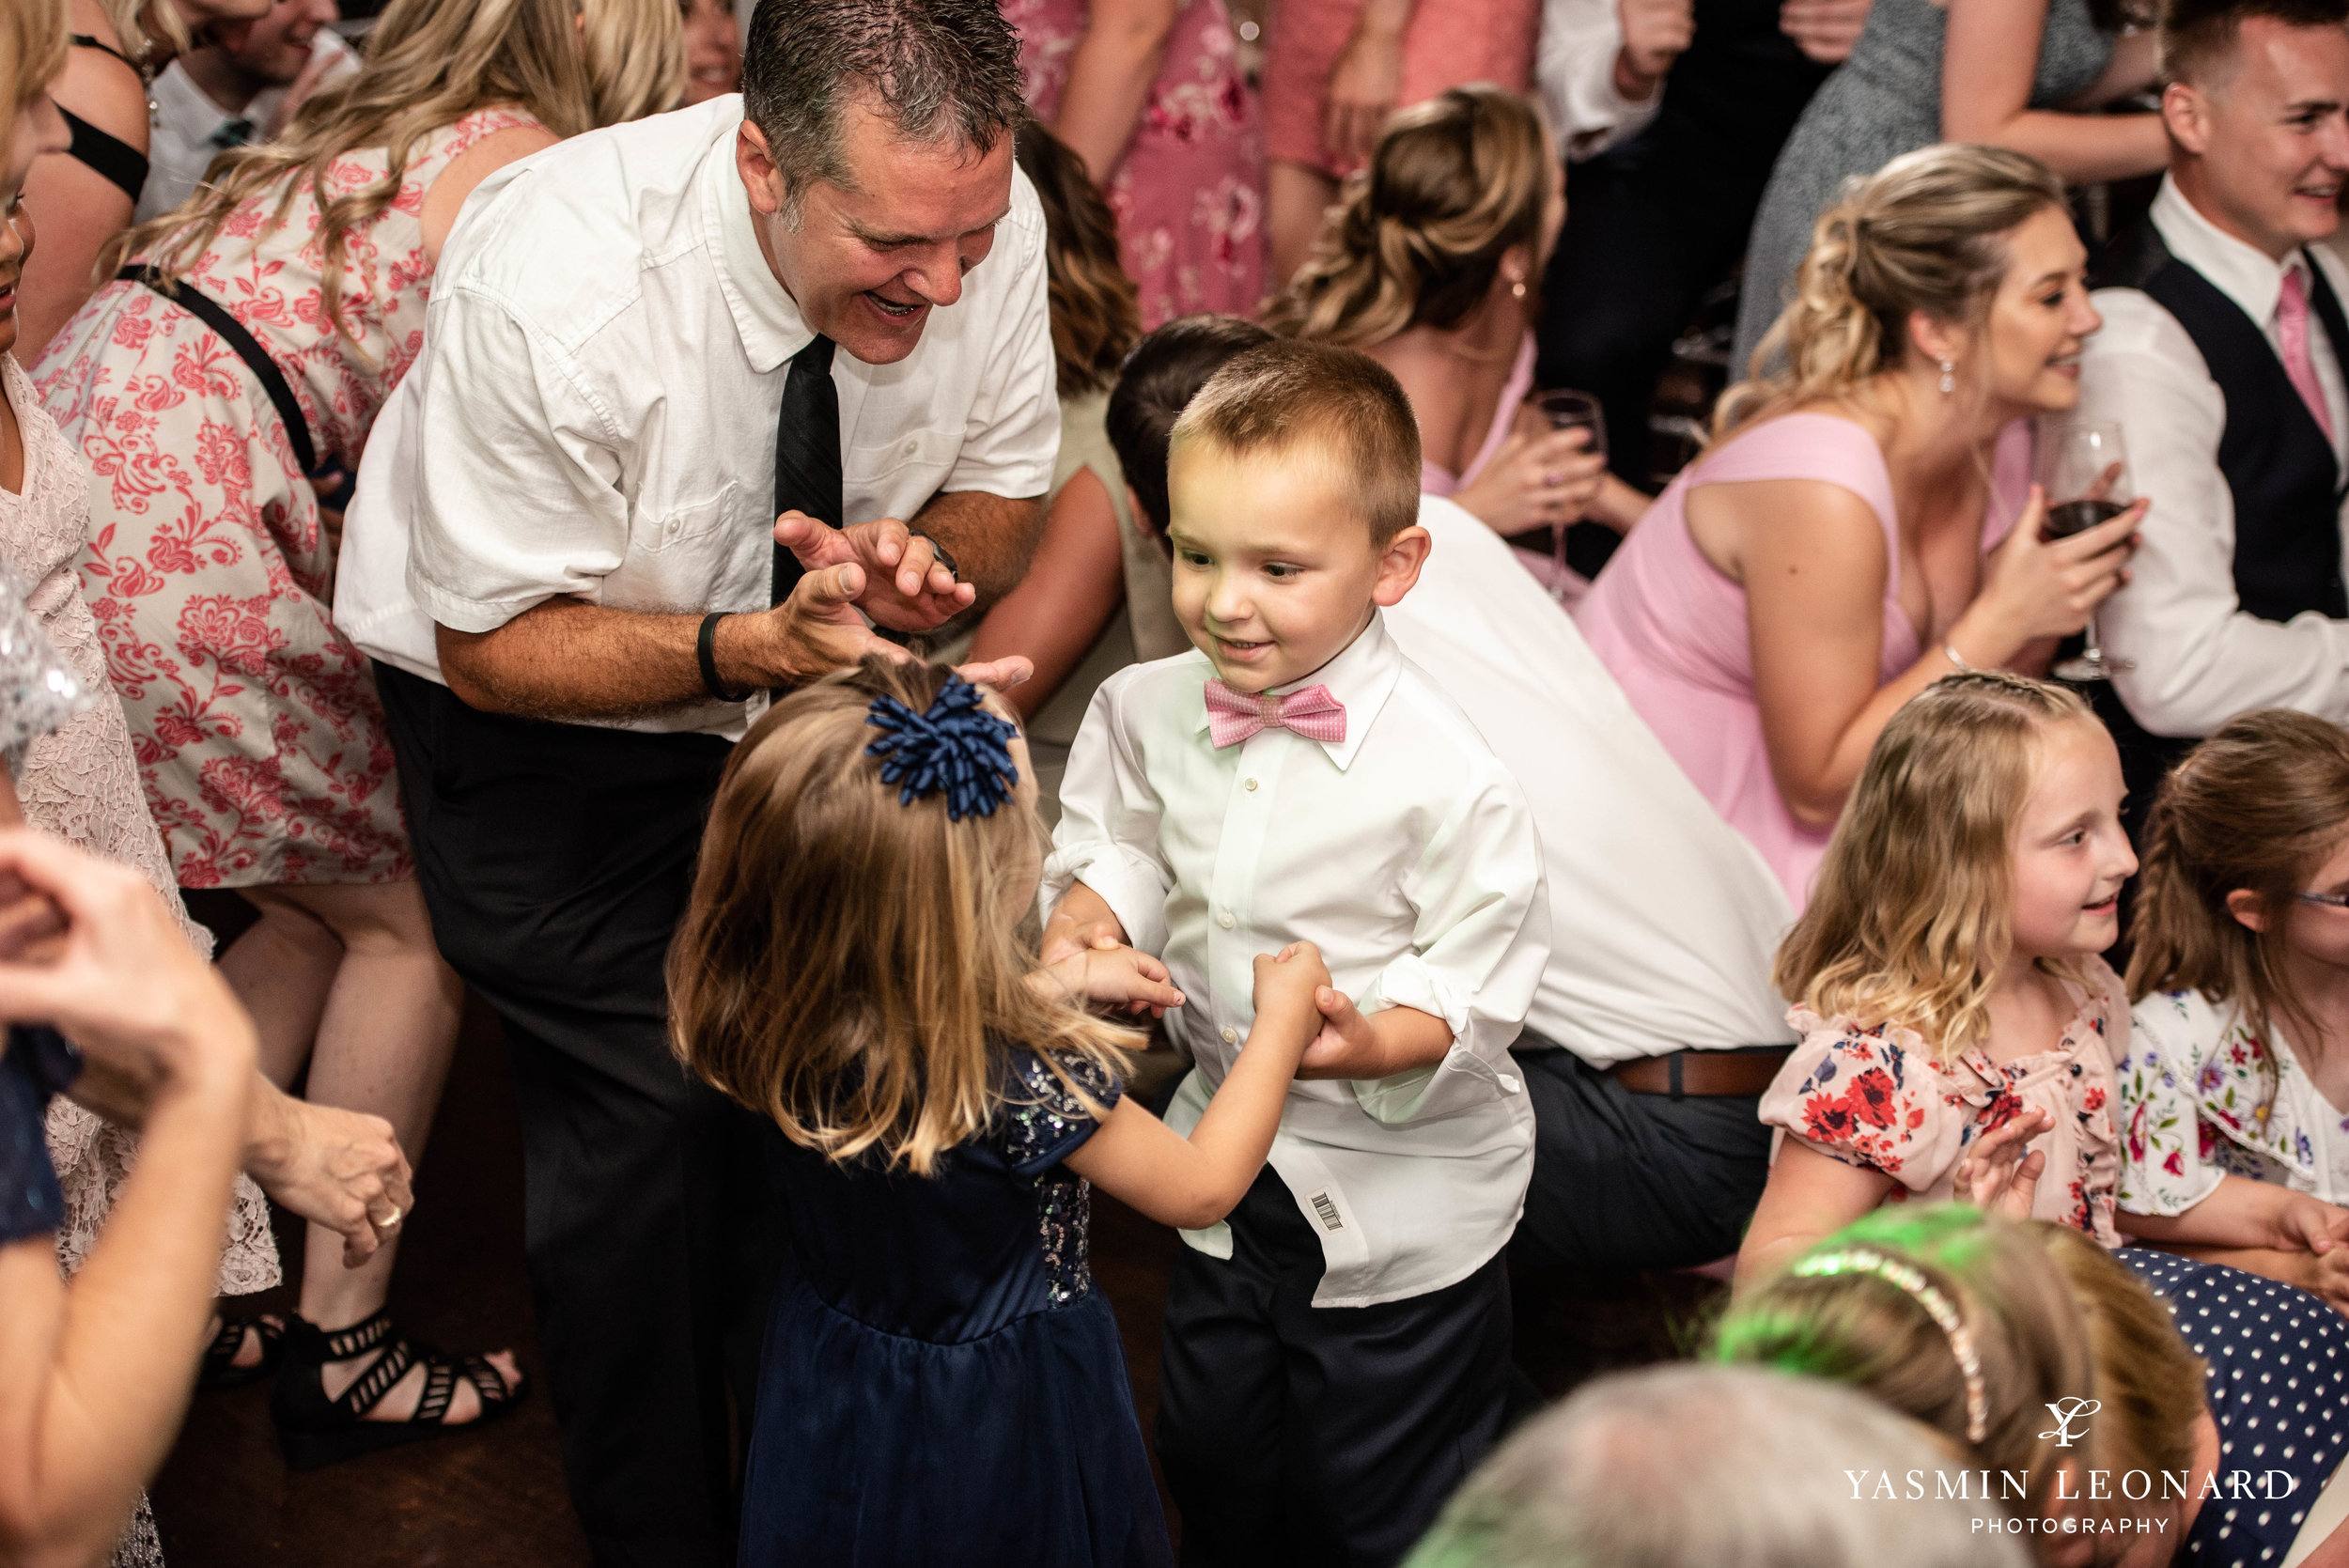 Separk Mansion - NC Weddings - Gastonia Wedding - NC Wedding Venues - Pink and Blue Wedding Ideas - Pink Bridesmaid Dresses - Yasmin Leonard Photography-63.jpg